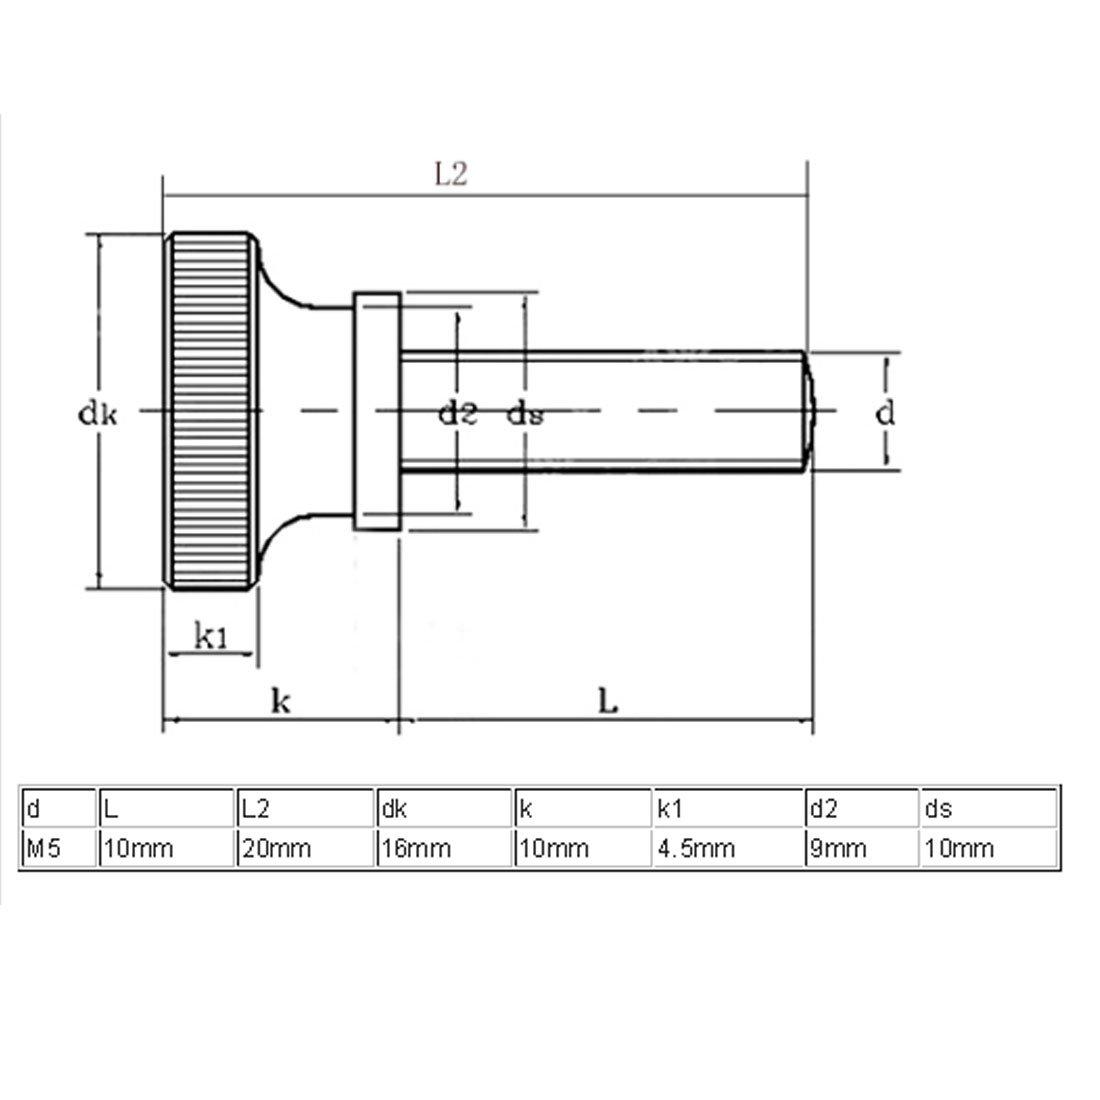 SOURCING MAP sourcingmap M5x10mm planas con estr/ías cabeza tornillos de apriete manual con rosca Tornillos de Sujeci/ón 8pcs